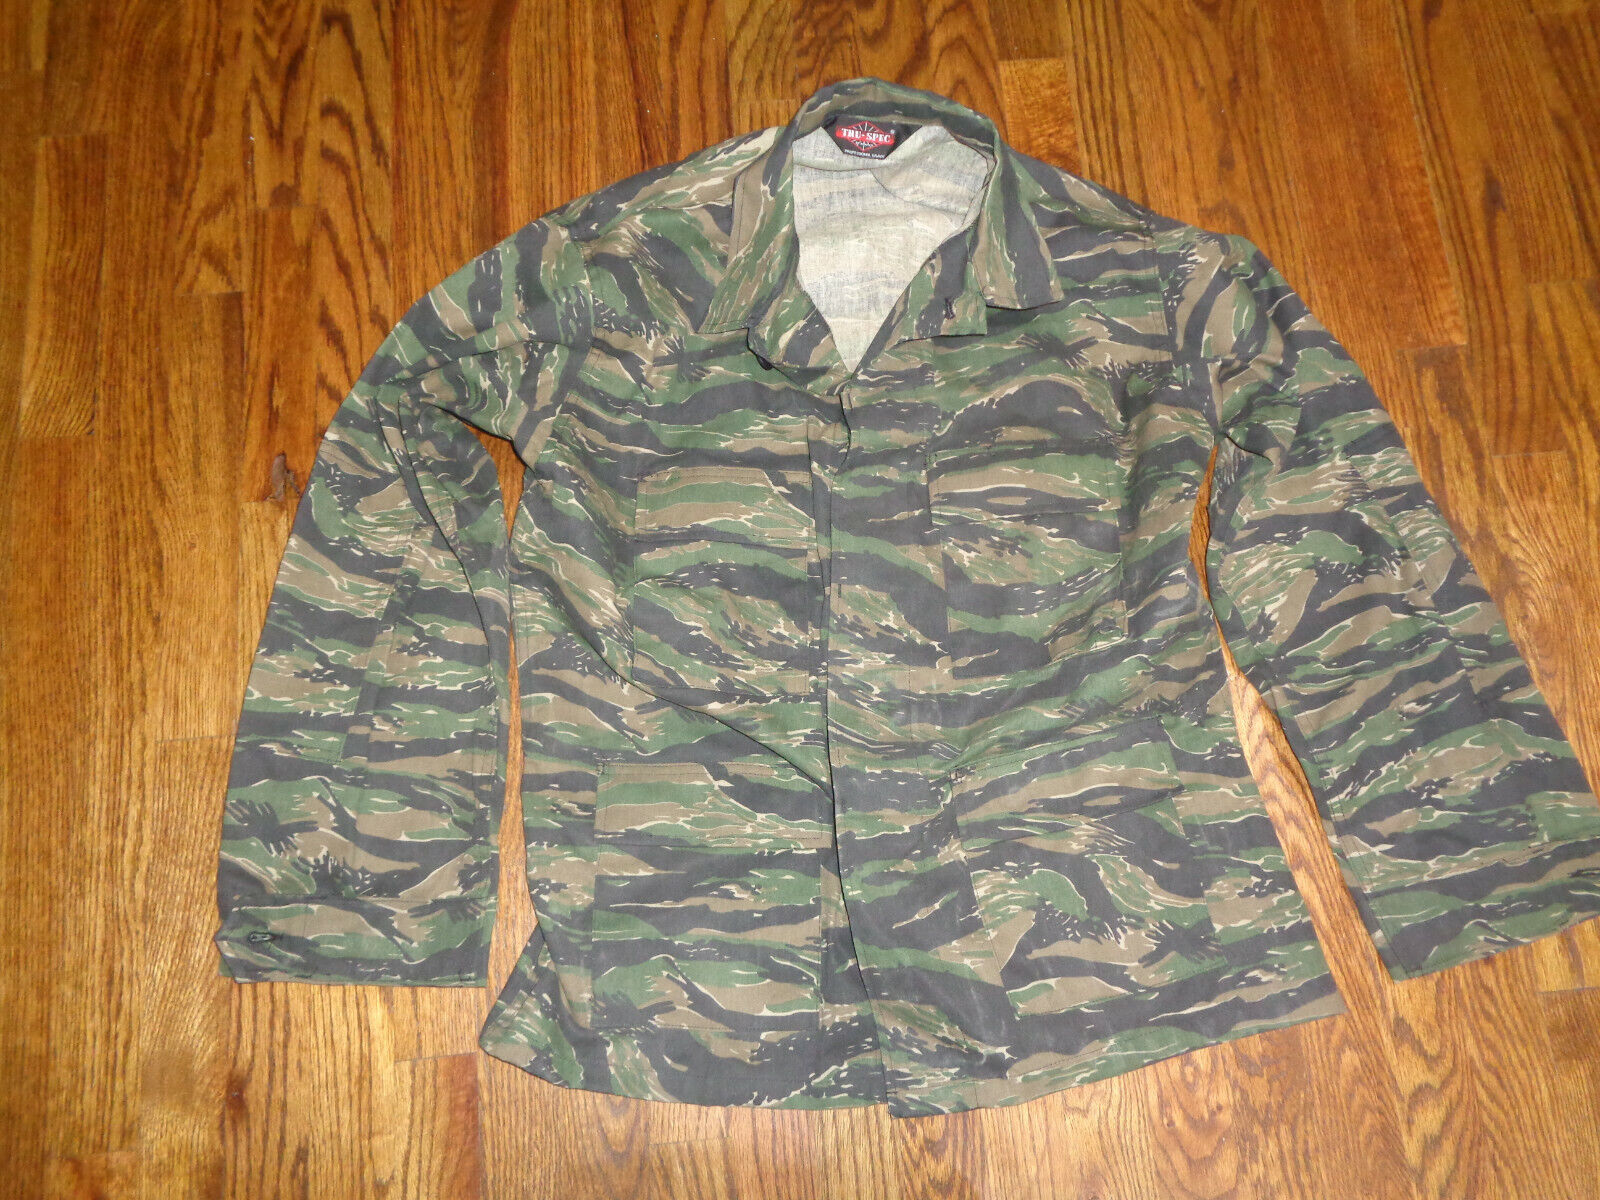 Jungle Tiger Stripe BDU Shirt Large Regular Tru-Spec Field Shirt  - $10.00